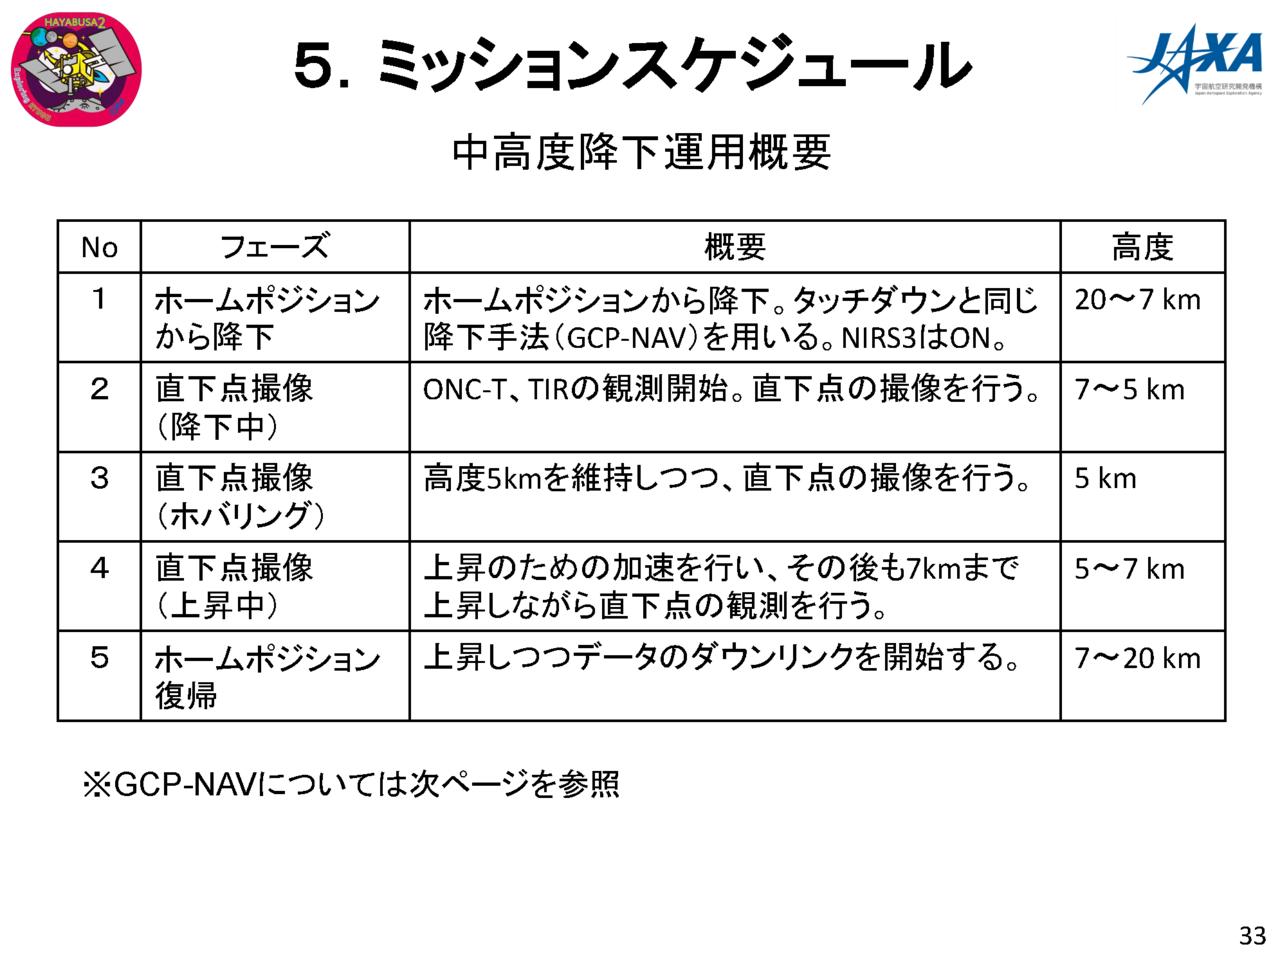 f:id:Imamura:20180719131728p:plain